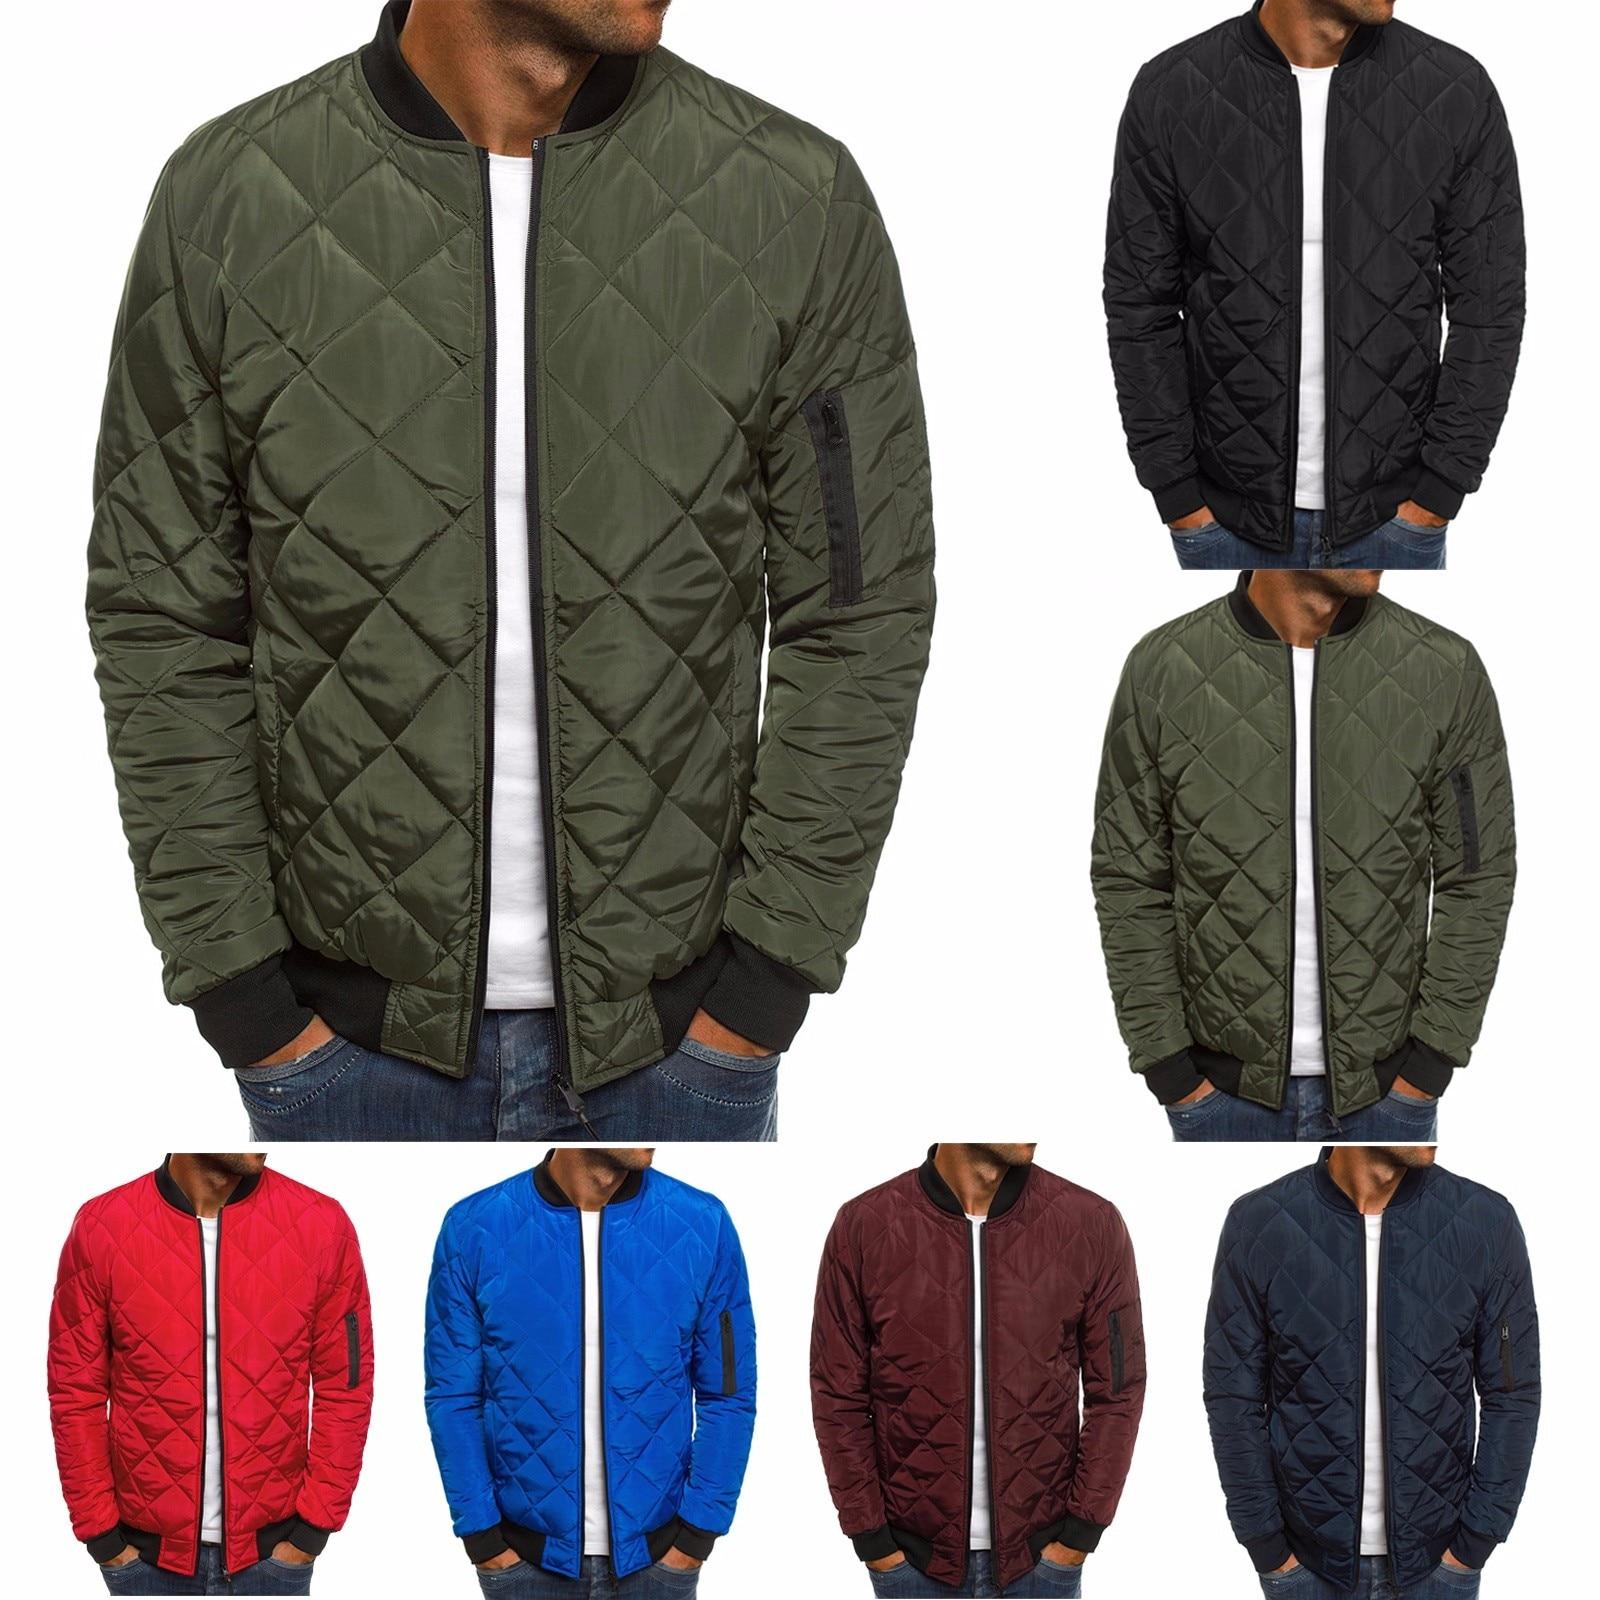 Men Autumn Jacket Wind Breaker Casual Plaid Parka Solid Color Brand Overcoat Men Thick Clothes Zipper Jackets Bomber Jacket